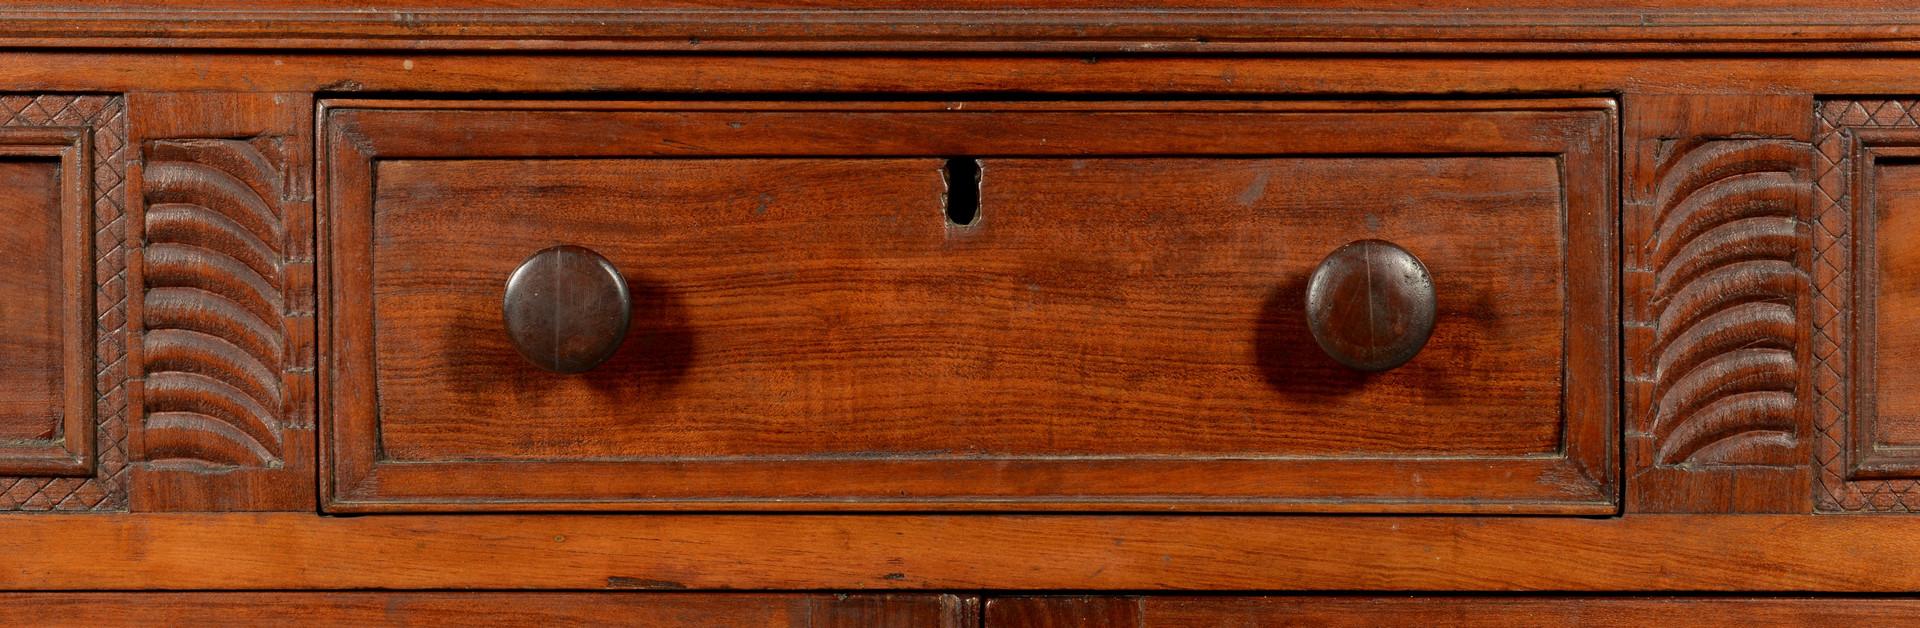 Lot 73: East TN Corner Cupboard, illust. Art & Mystery